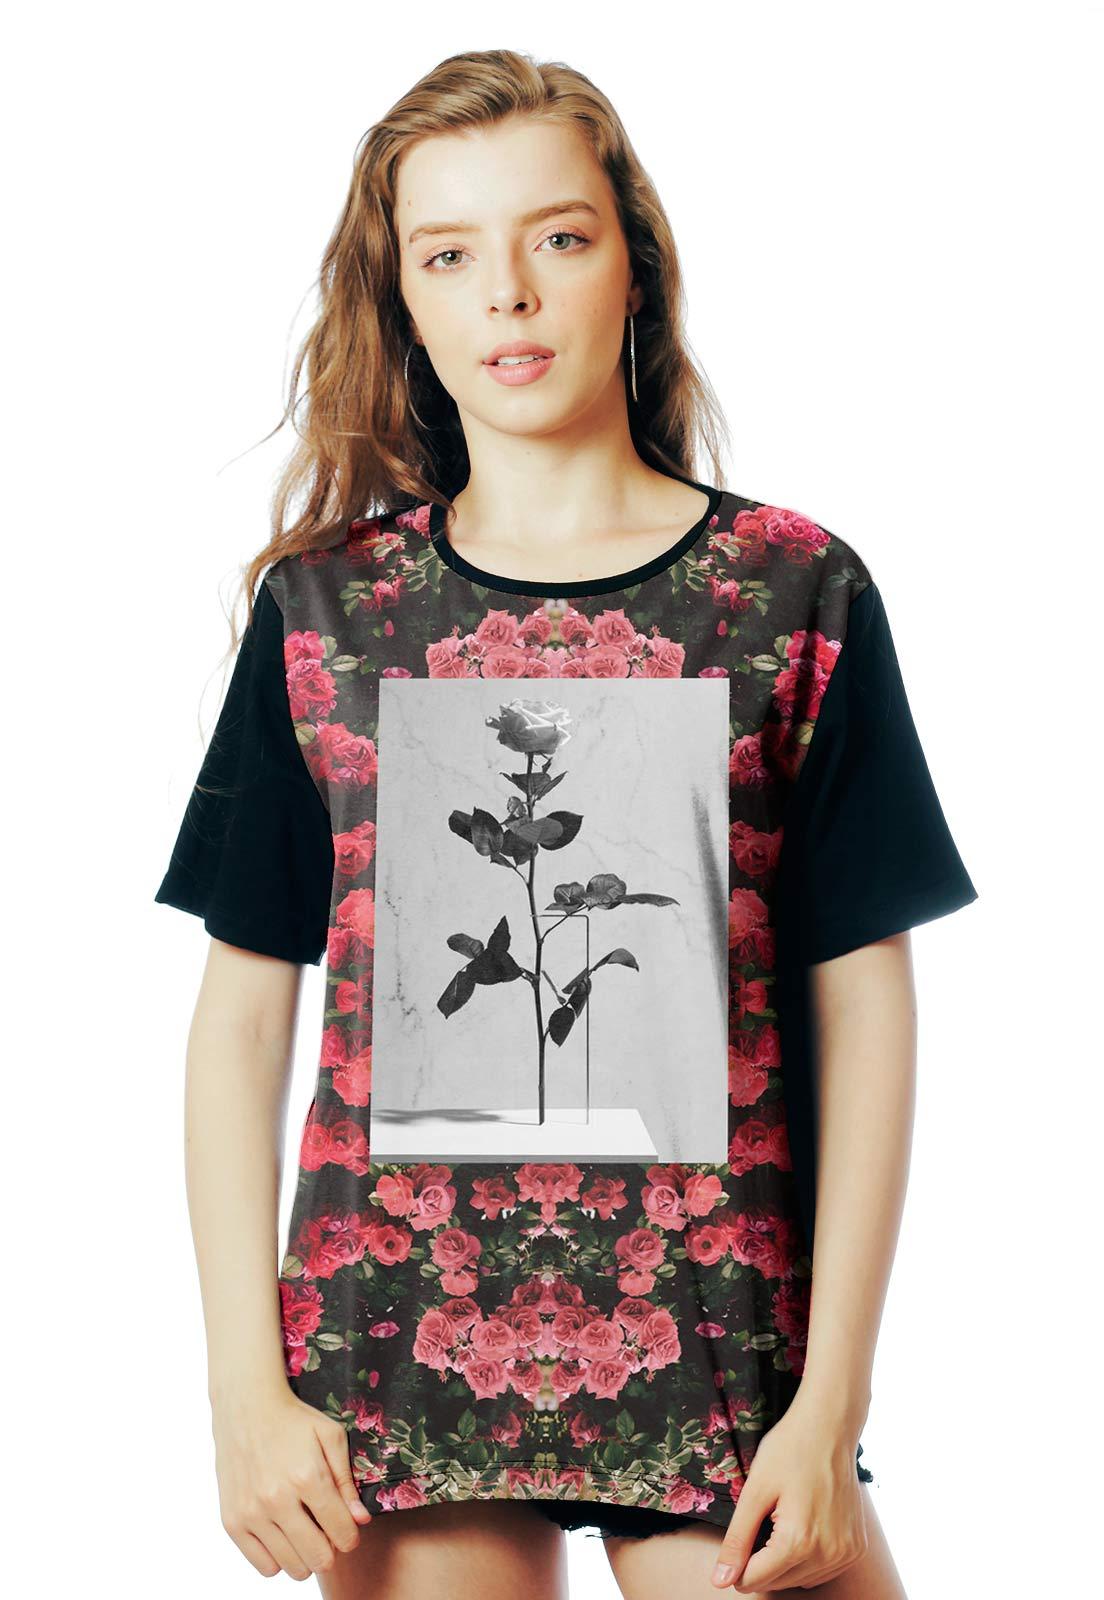 Camiseta Floral ElephunK Estampada Violator Florida Preta